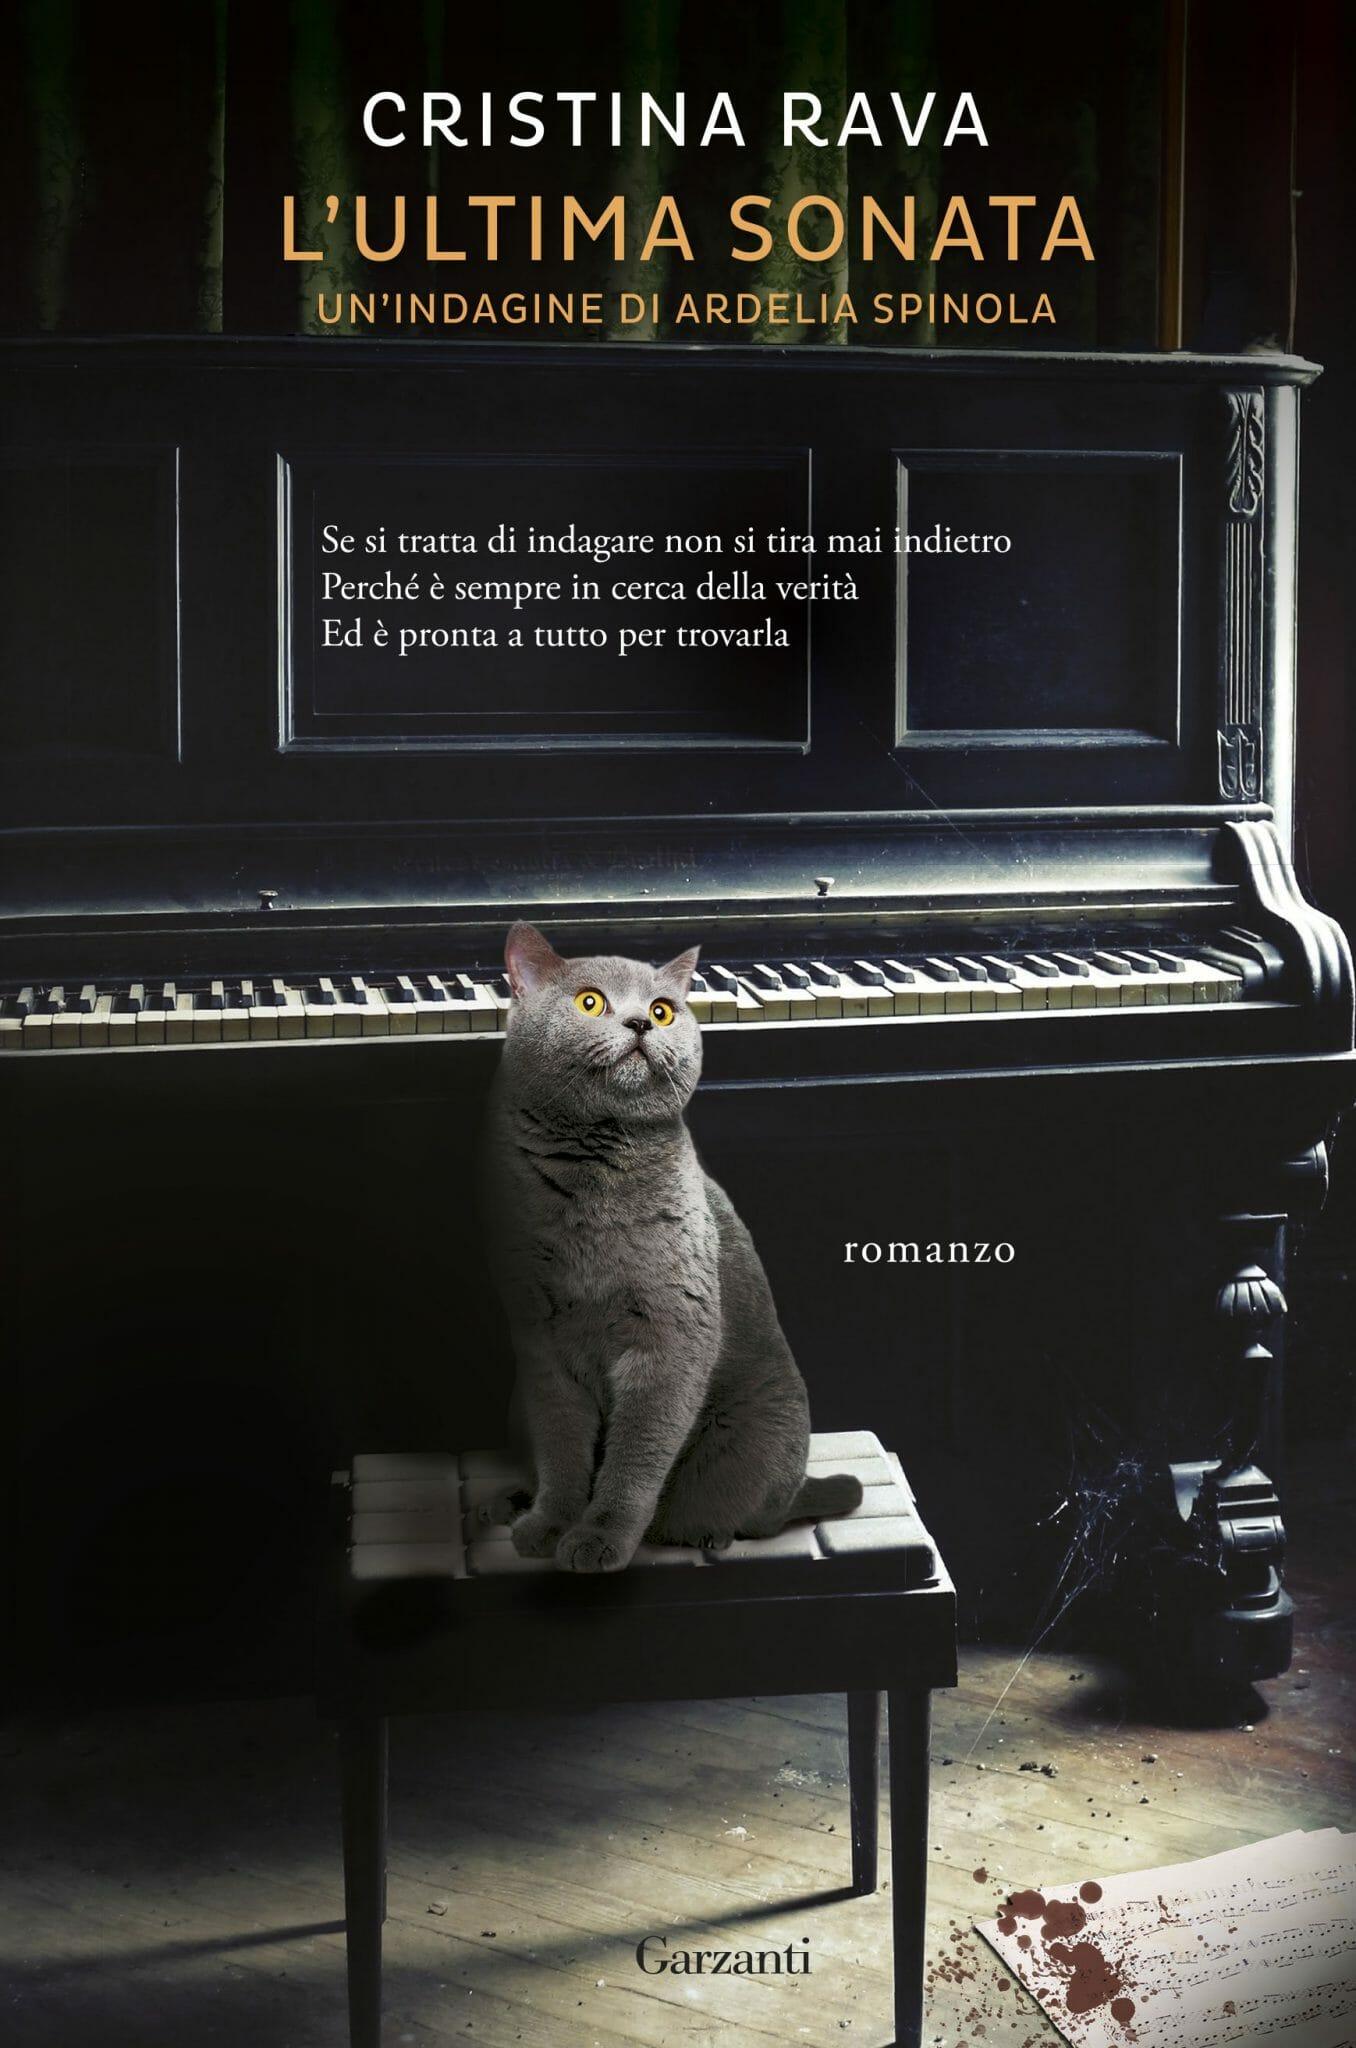 l'ultima sonata cristina rava indagine copertina